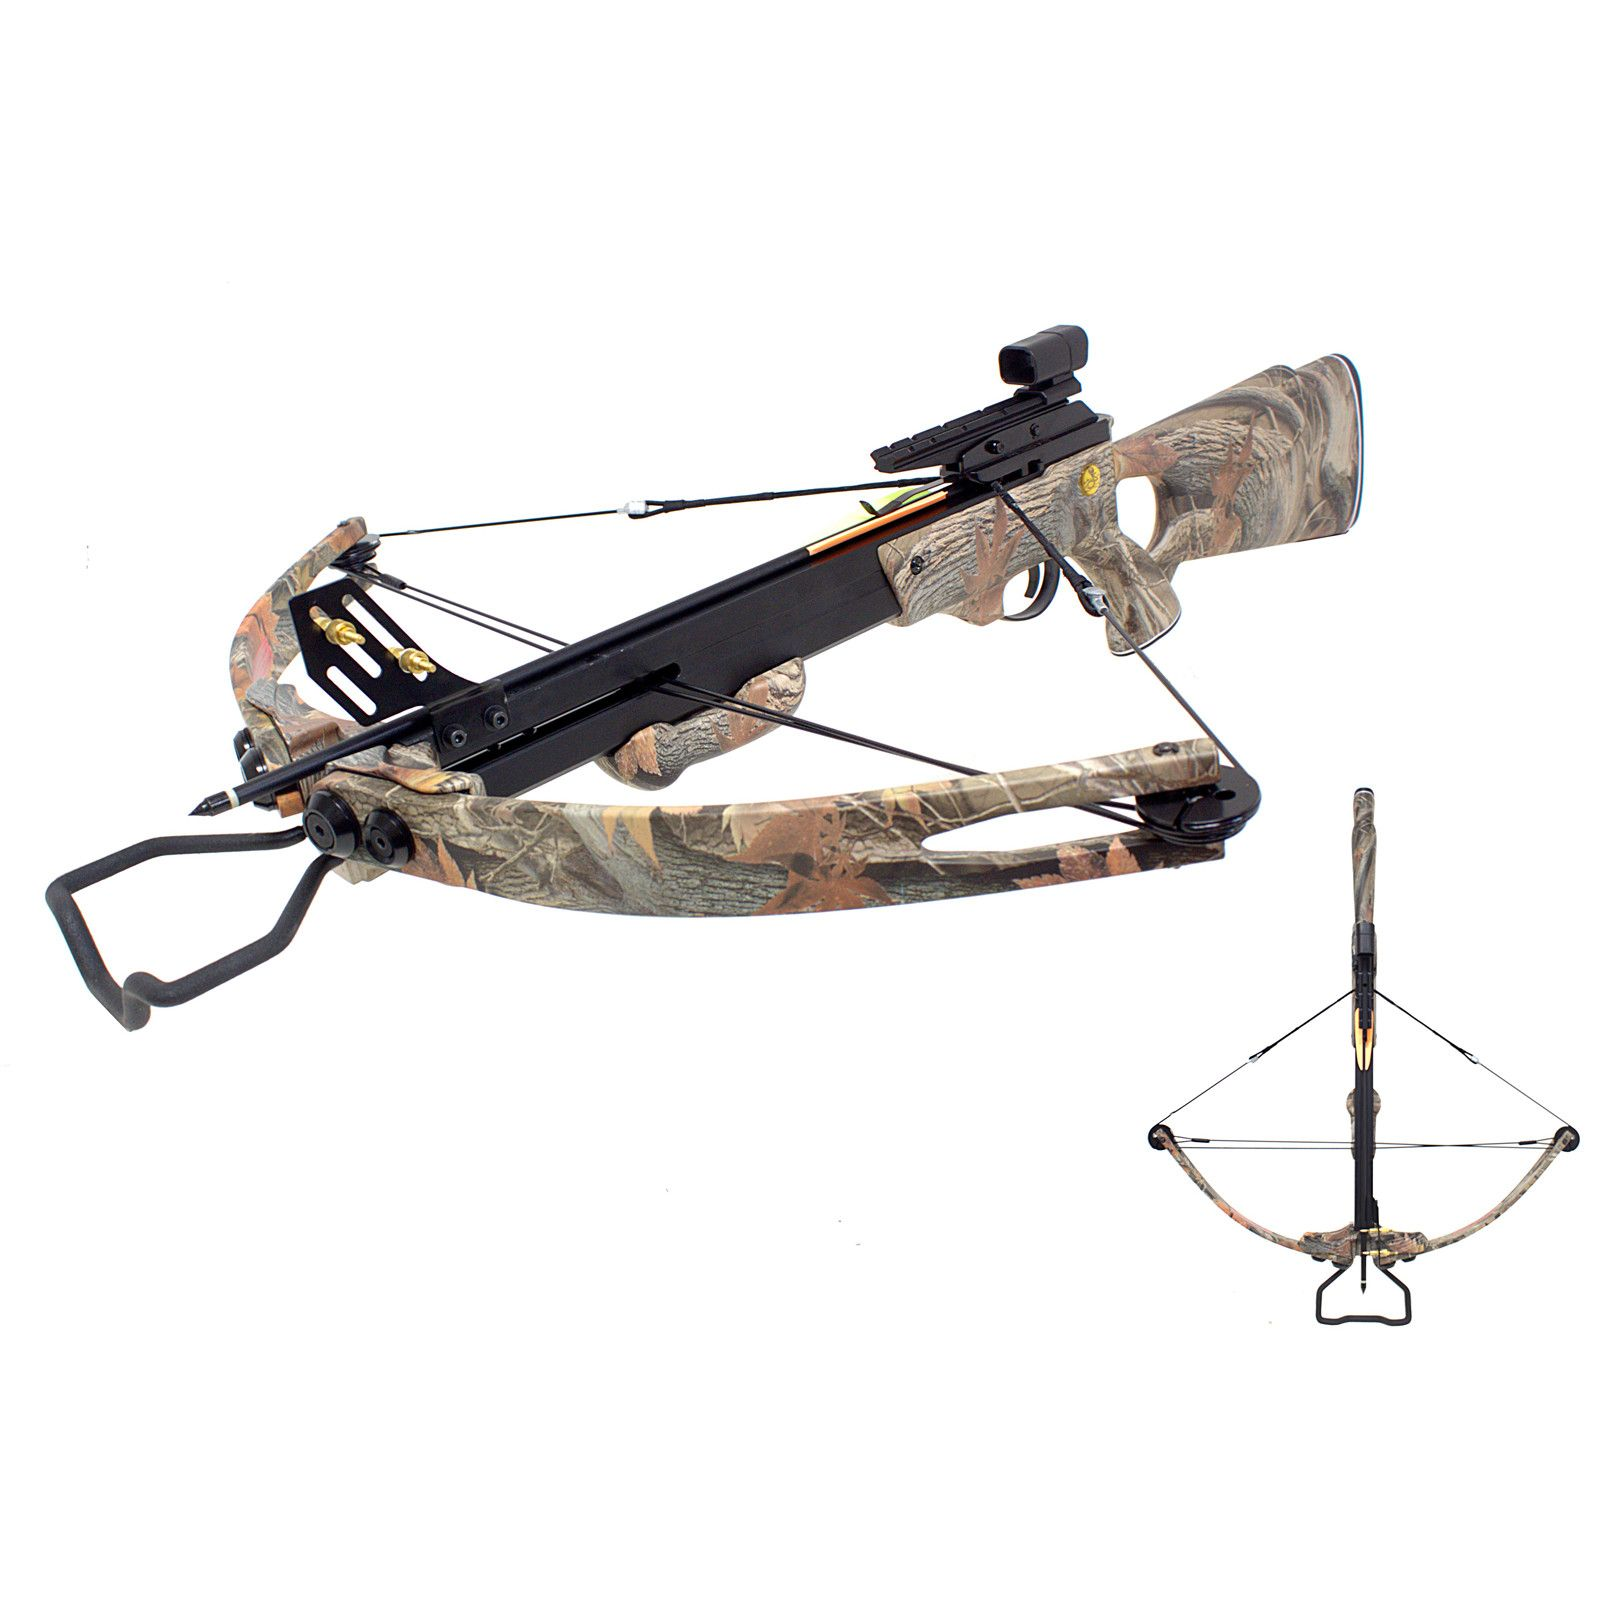 Compound Crossbows vs  Recurve Crossbows | Archery Bow, News